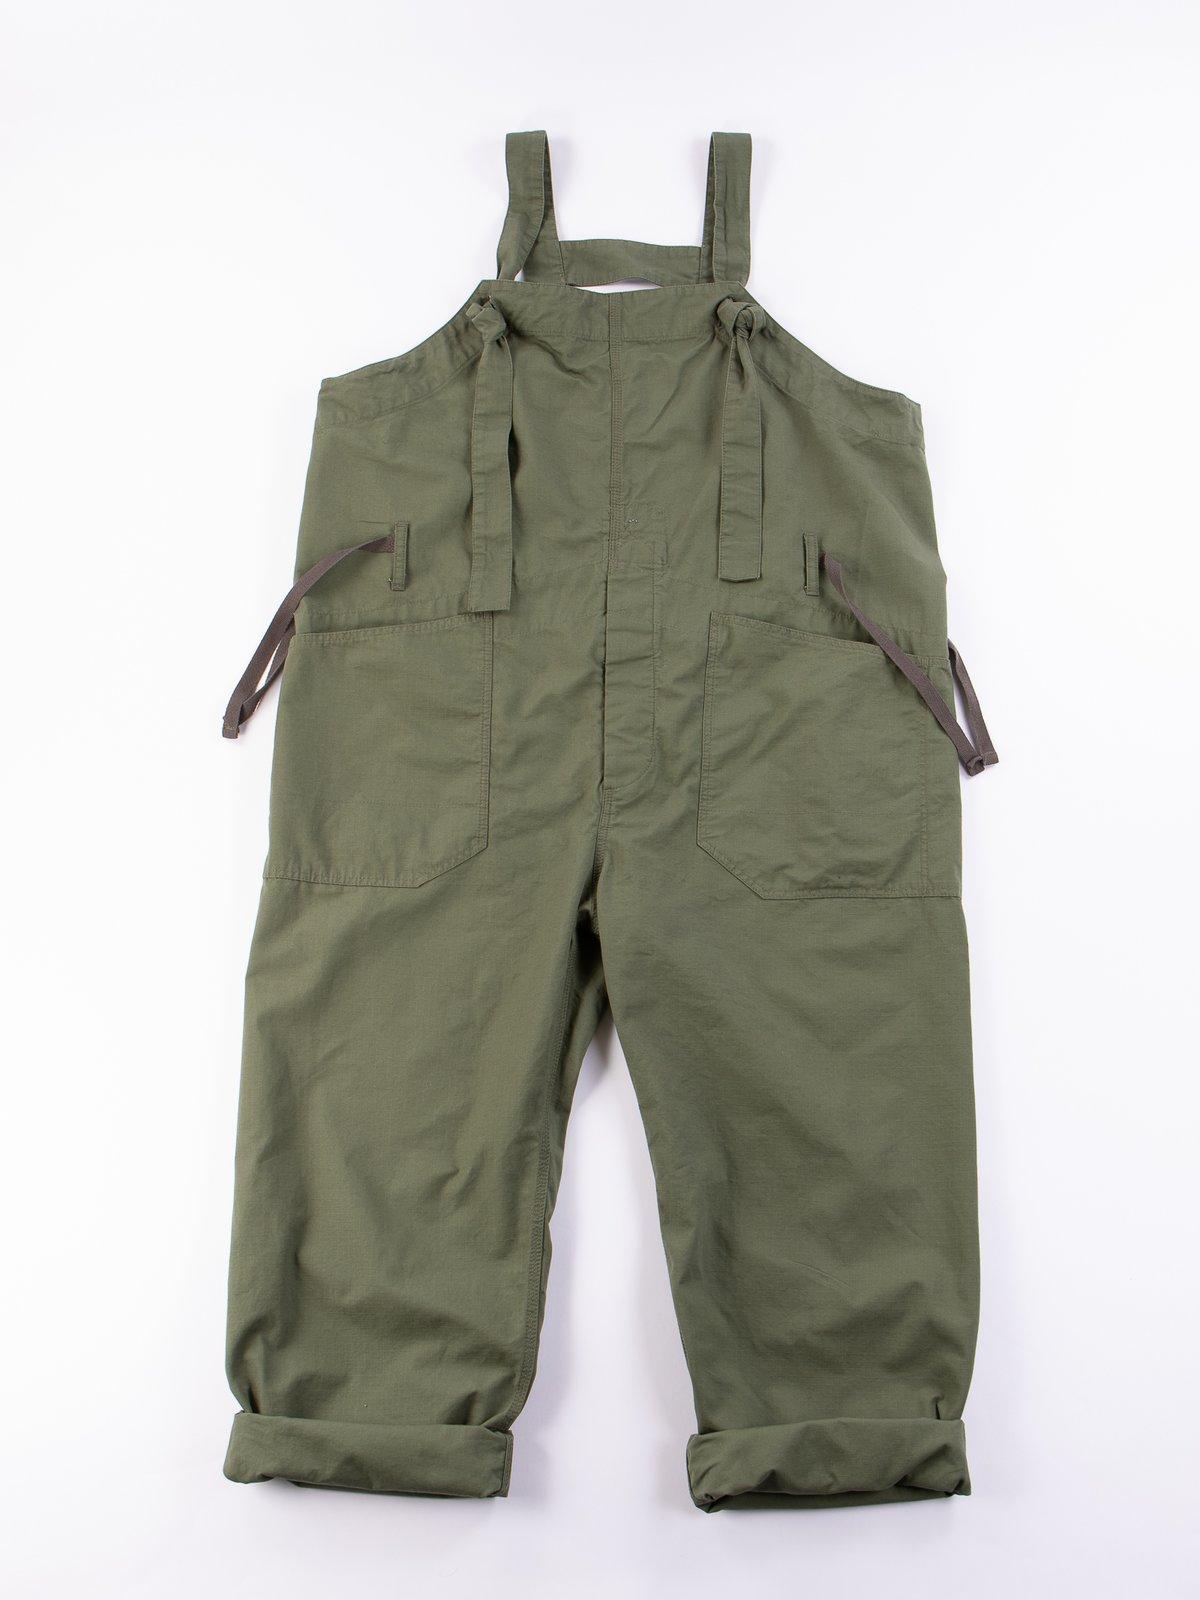 engineered garment 2.jpg